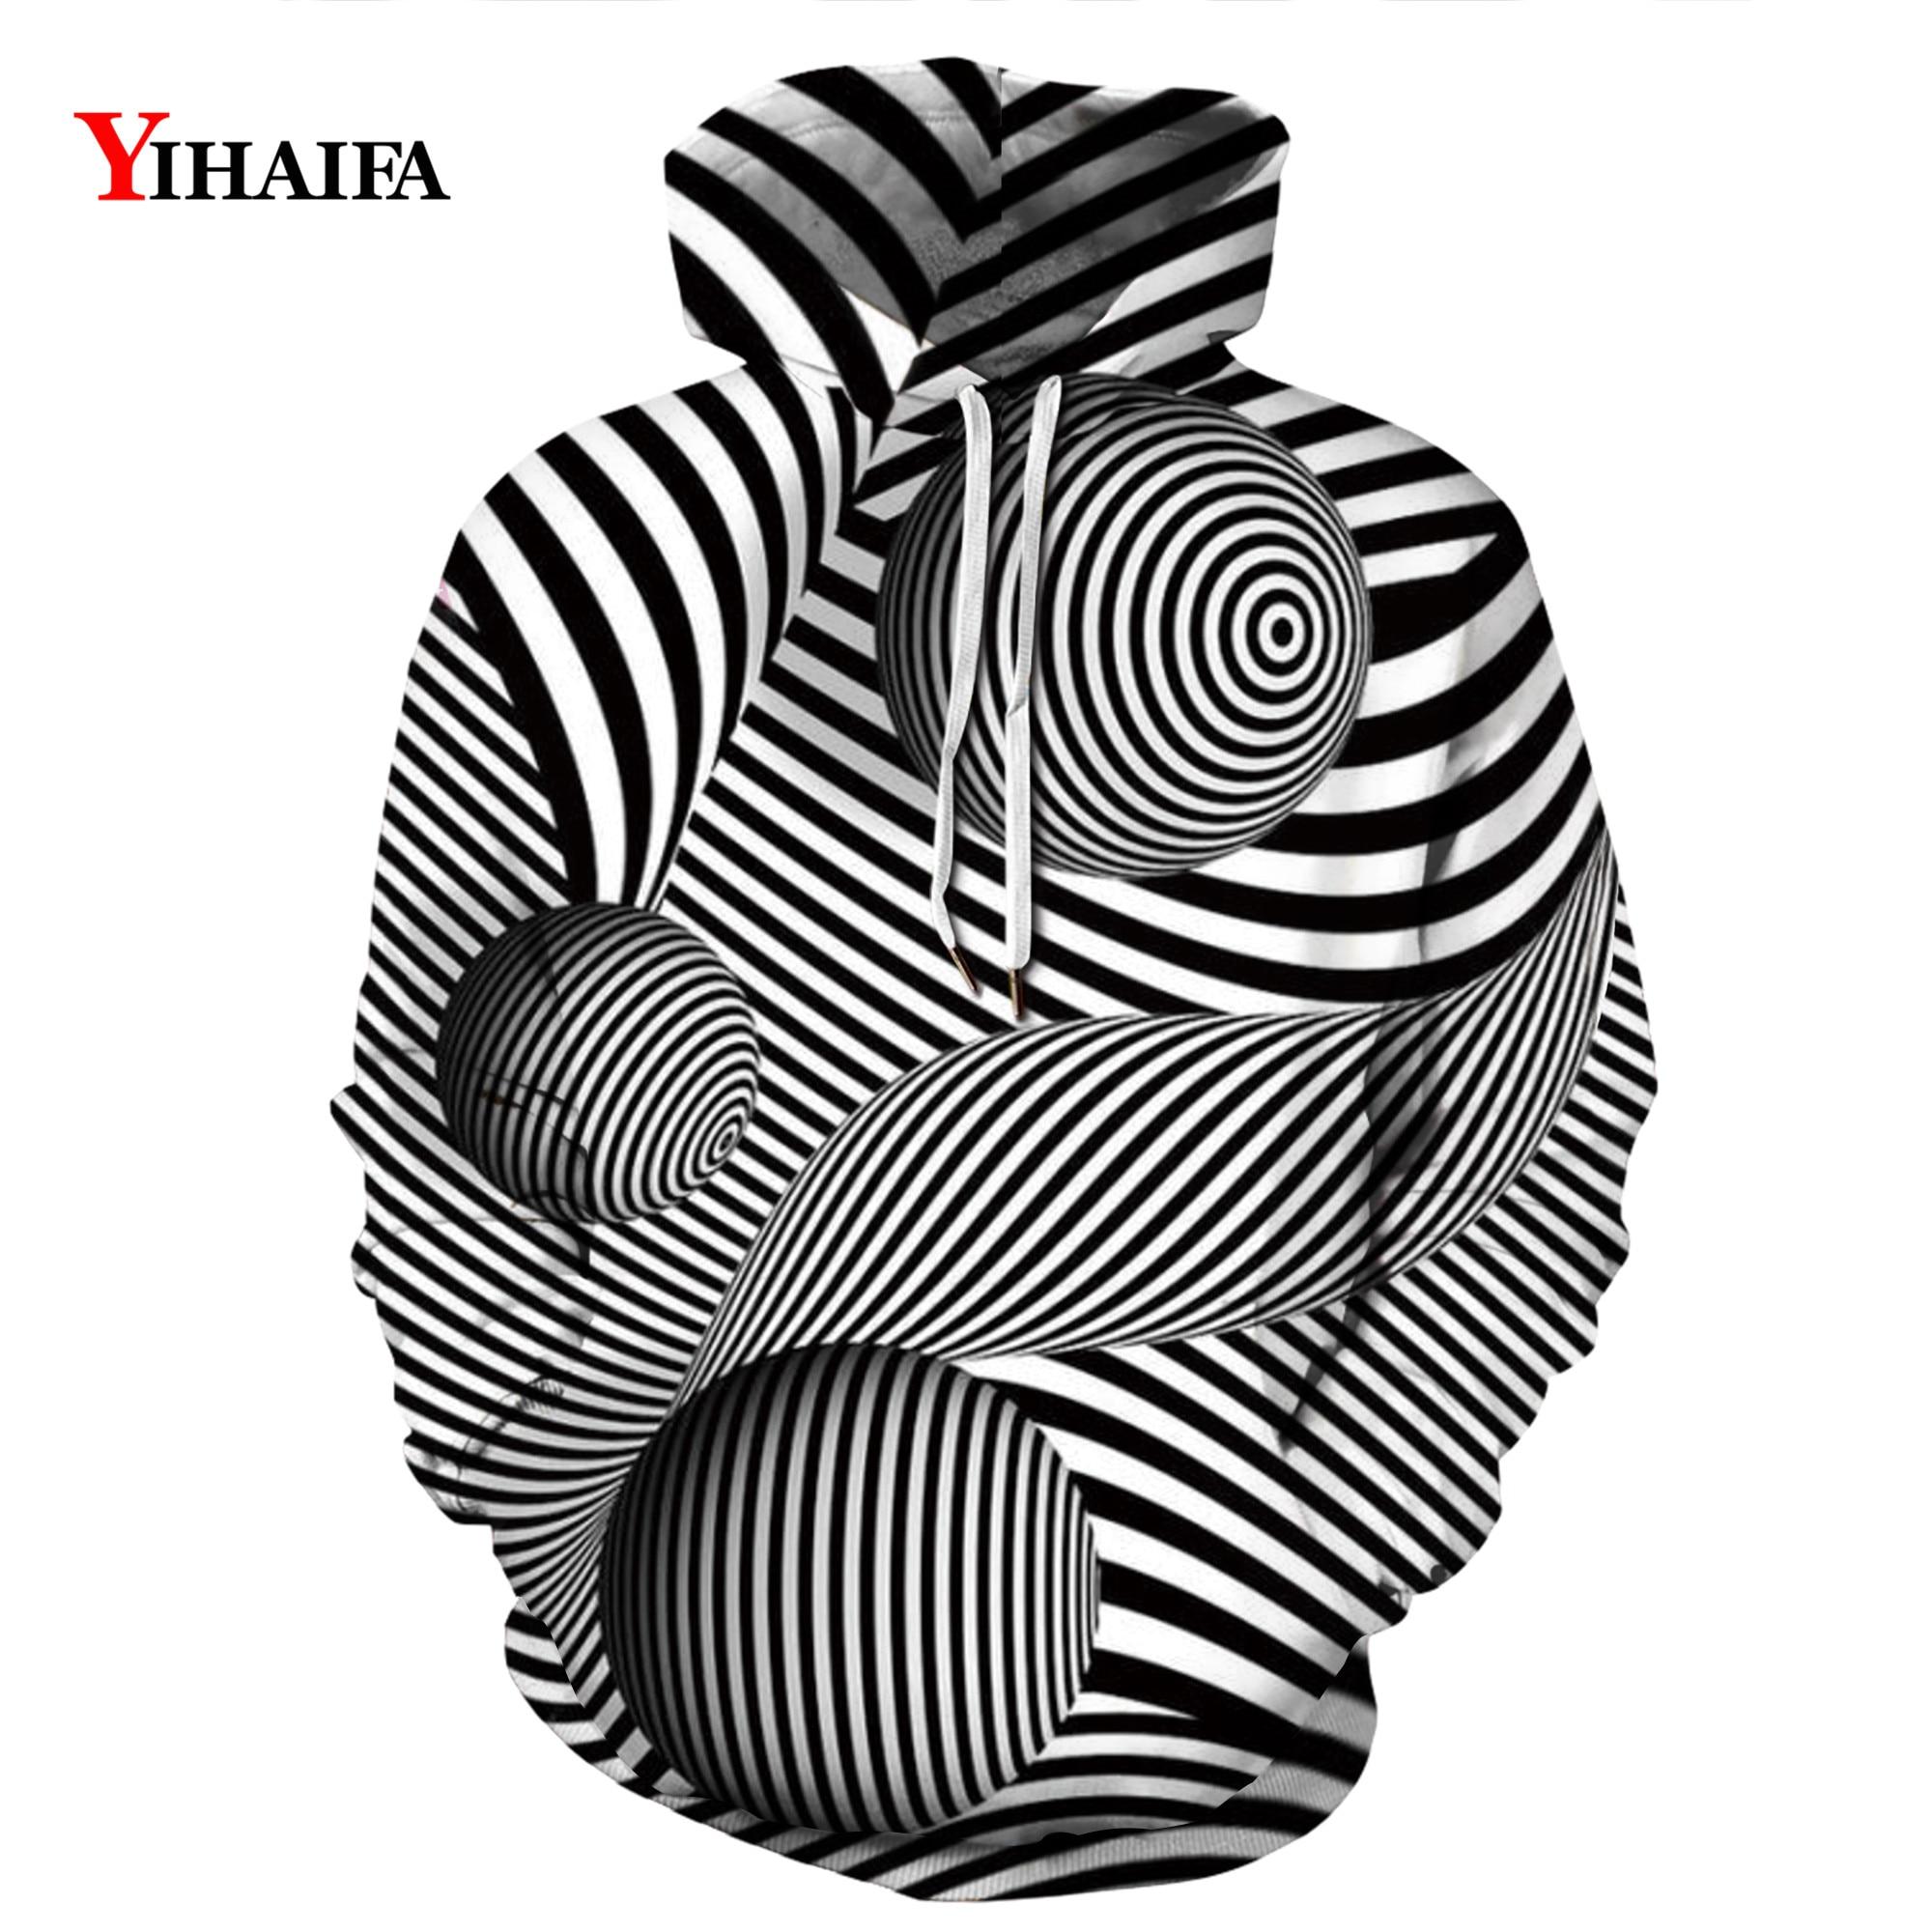 Mens Womens 3D Sweatshirt Black White Hypnotic Vortex Graphic Print Hip Hop Hoodies Streetwear Pullover Tracksuit Tops in Hoodies amp Sweatshirts from Men 39 s Clothing